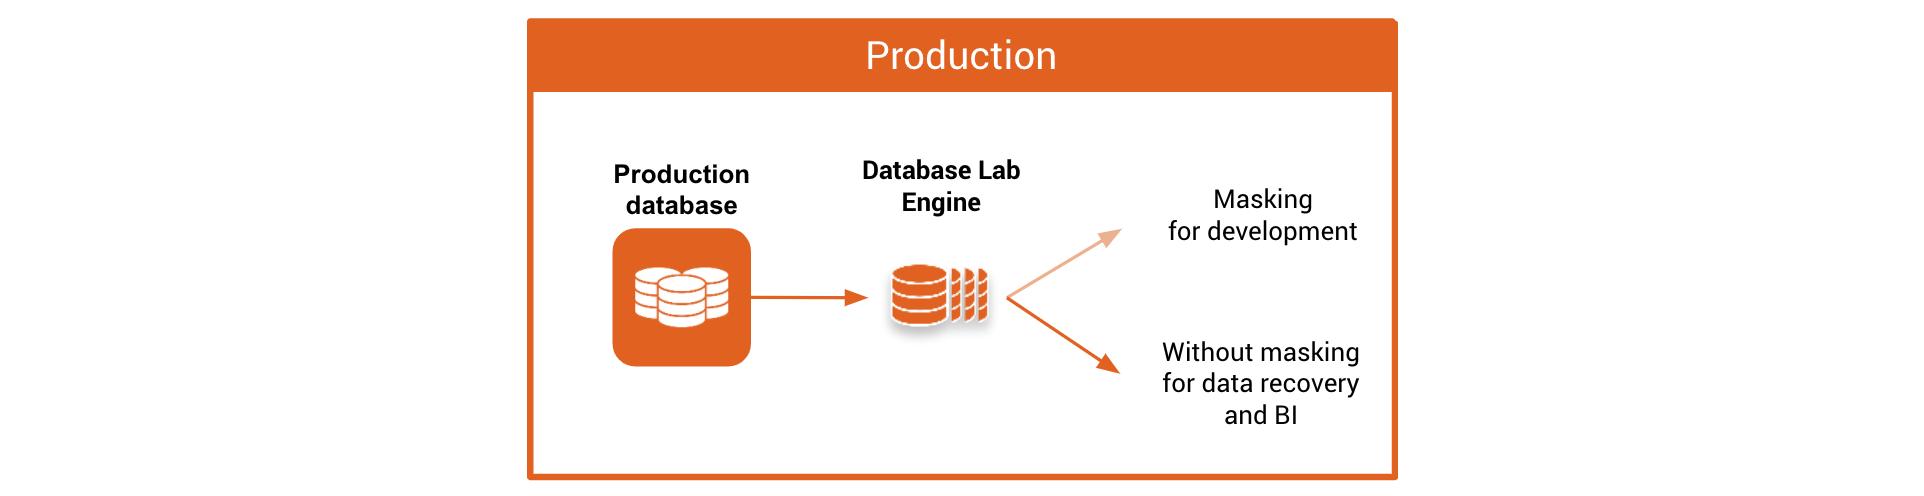 docs/assets/masking-2a-production.png